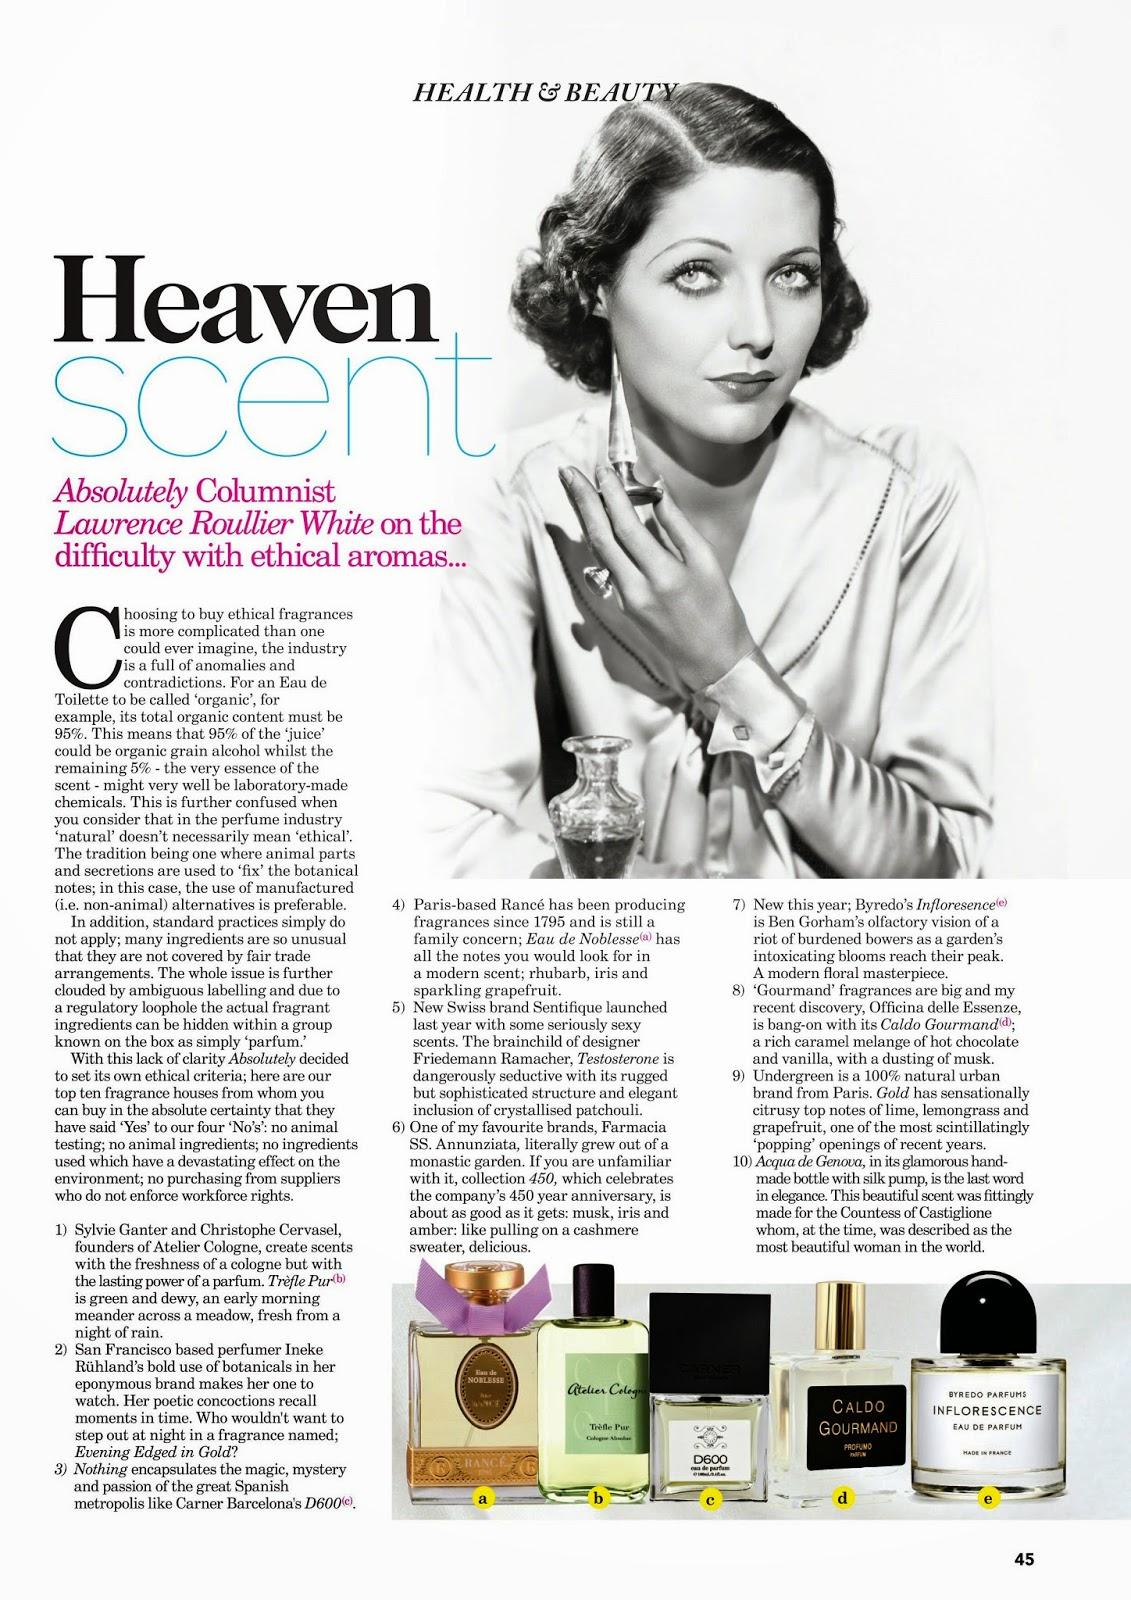 Heaven Scent: Ethical Fragrances